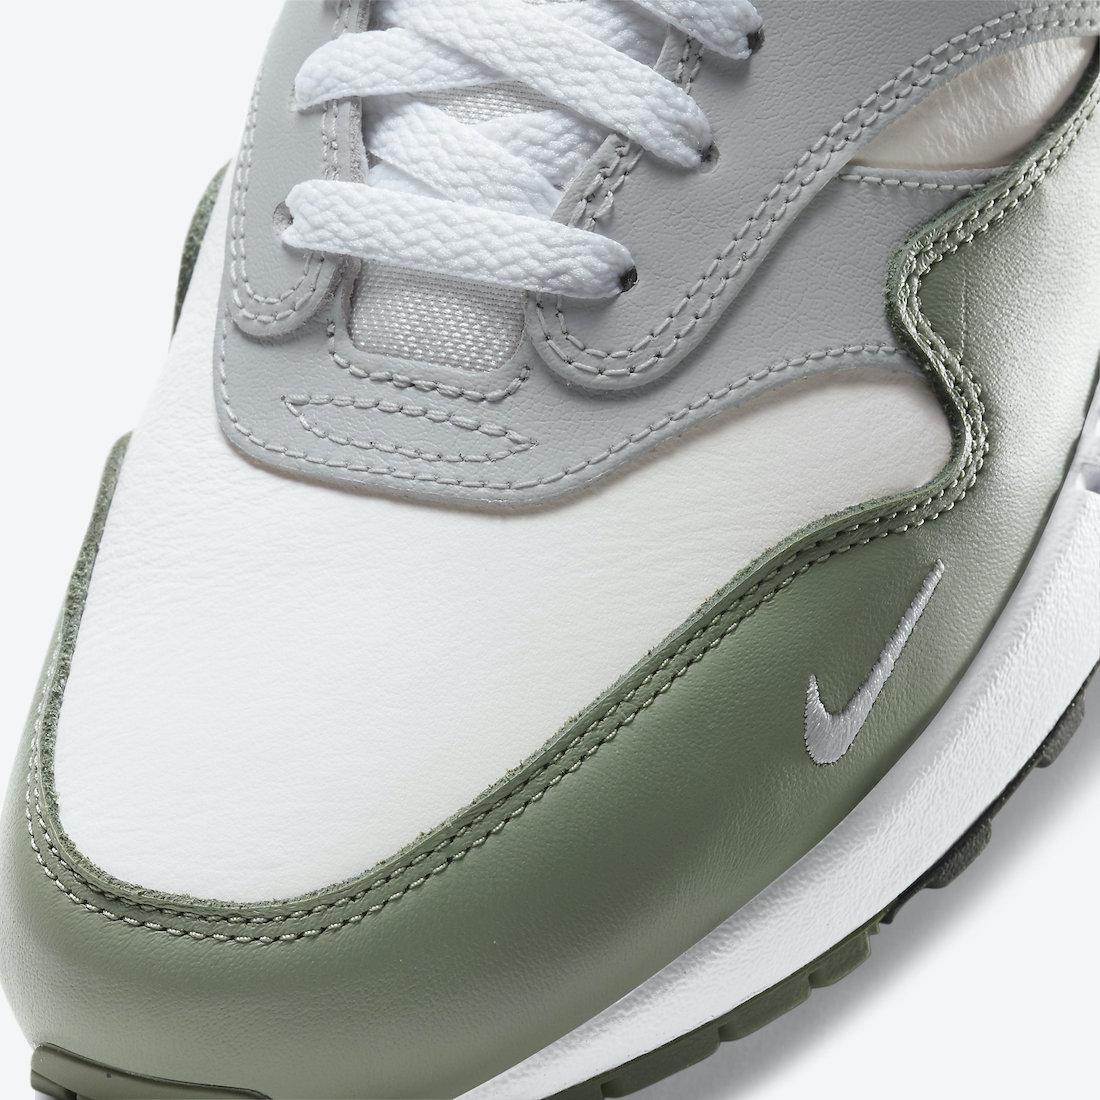 Nike-Air-Max-1-Spiral-Sage-DB5074-100-Release-Date-6